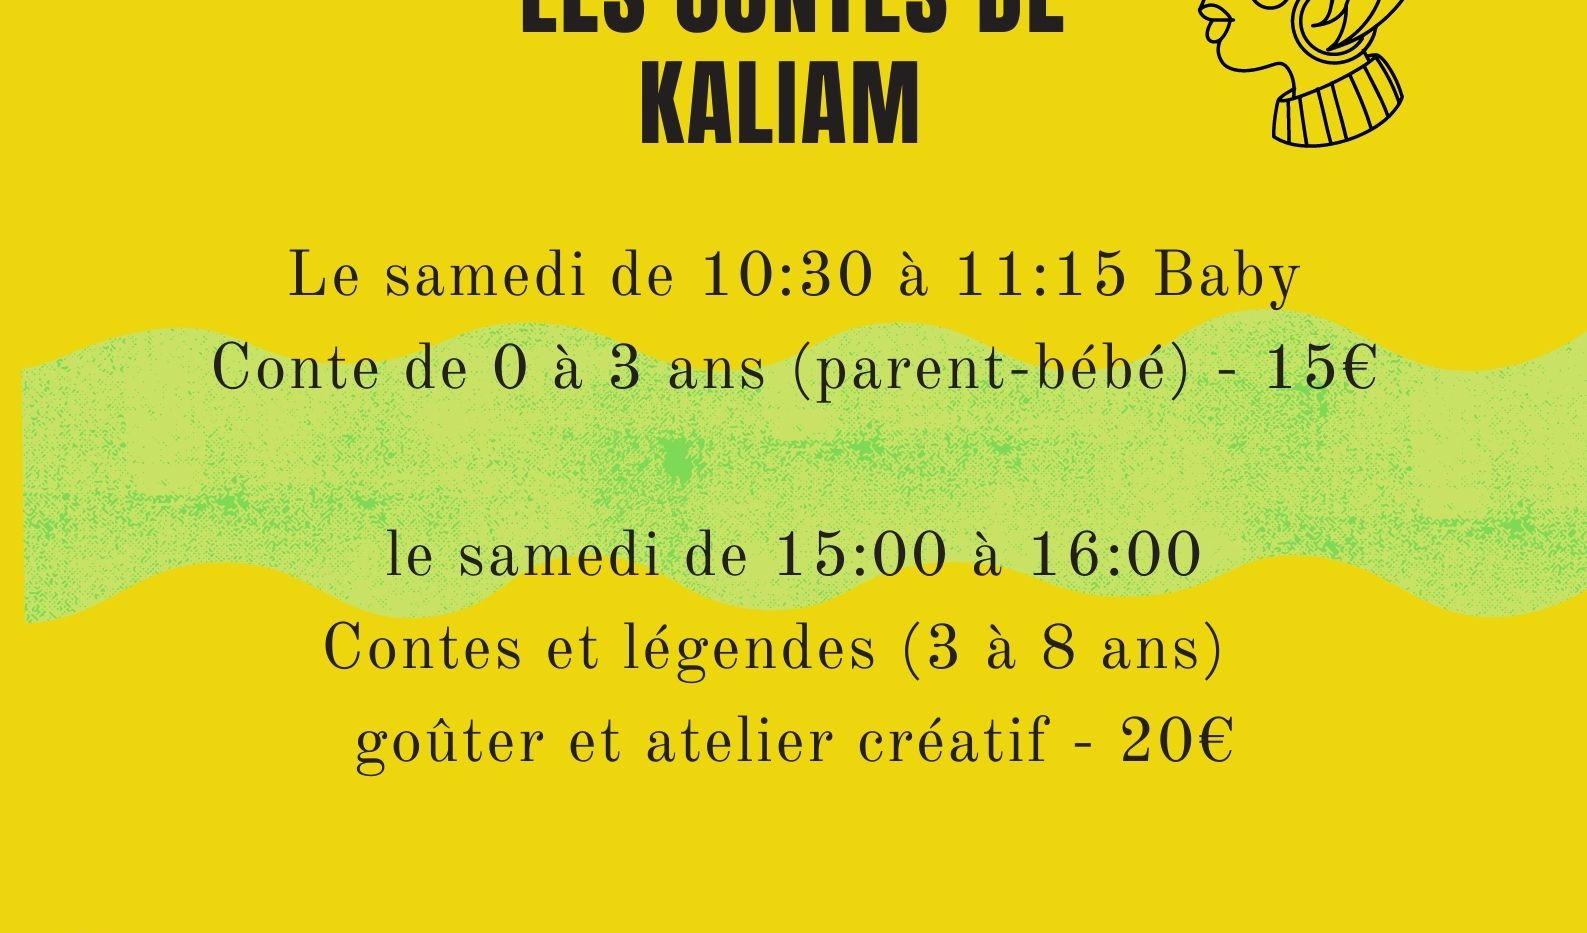 Les contes de Kaliam.jpeg